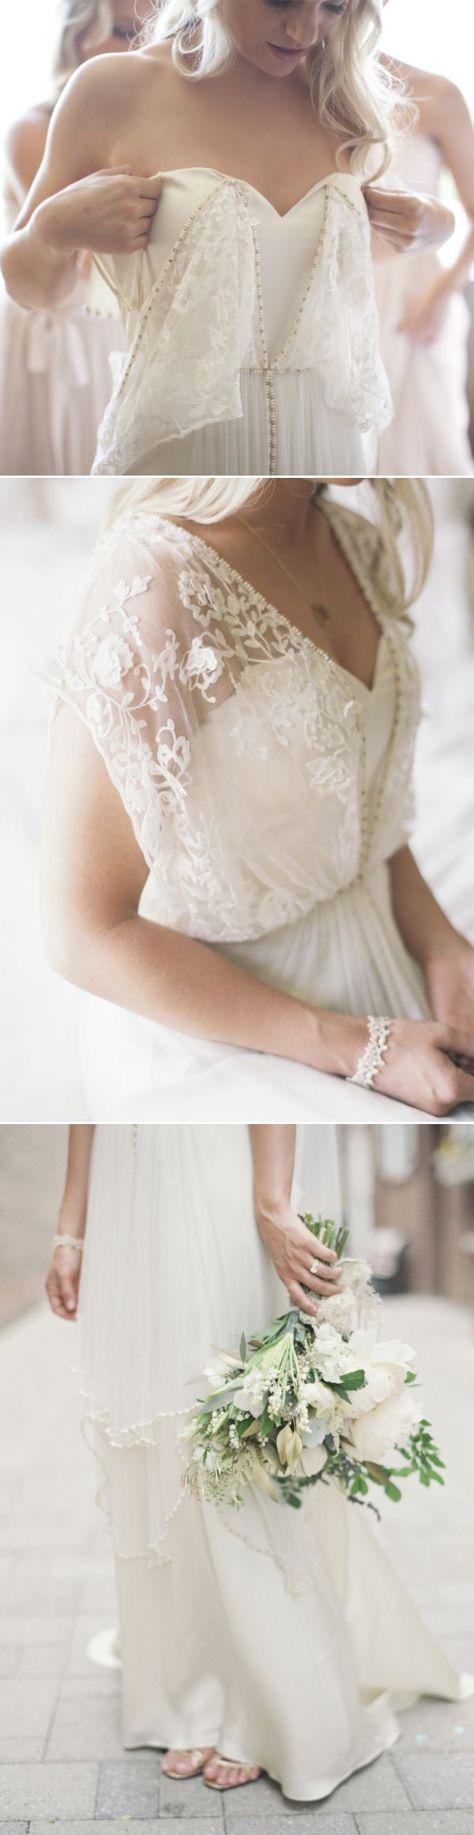 Wedding dresses for brides bridesmaid and flower girls boho